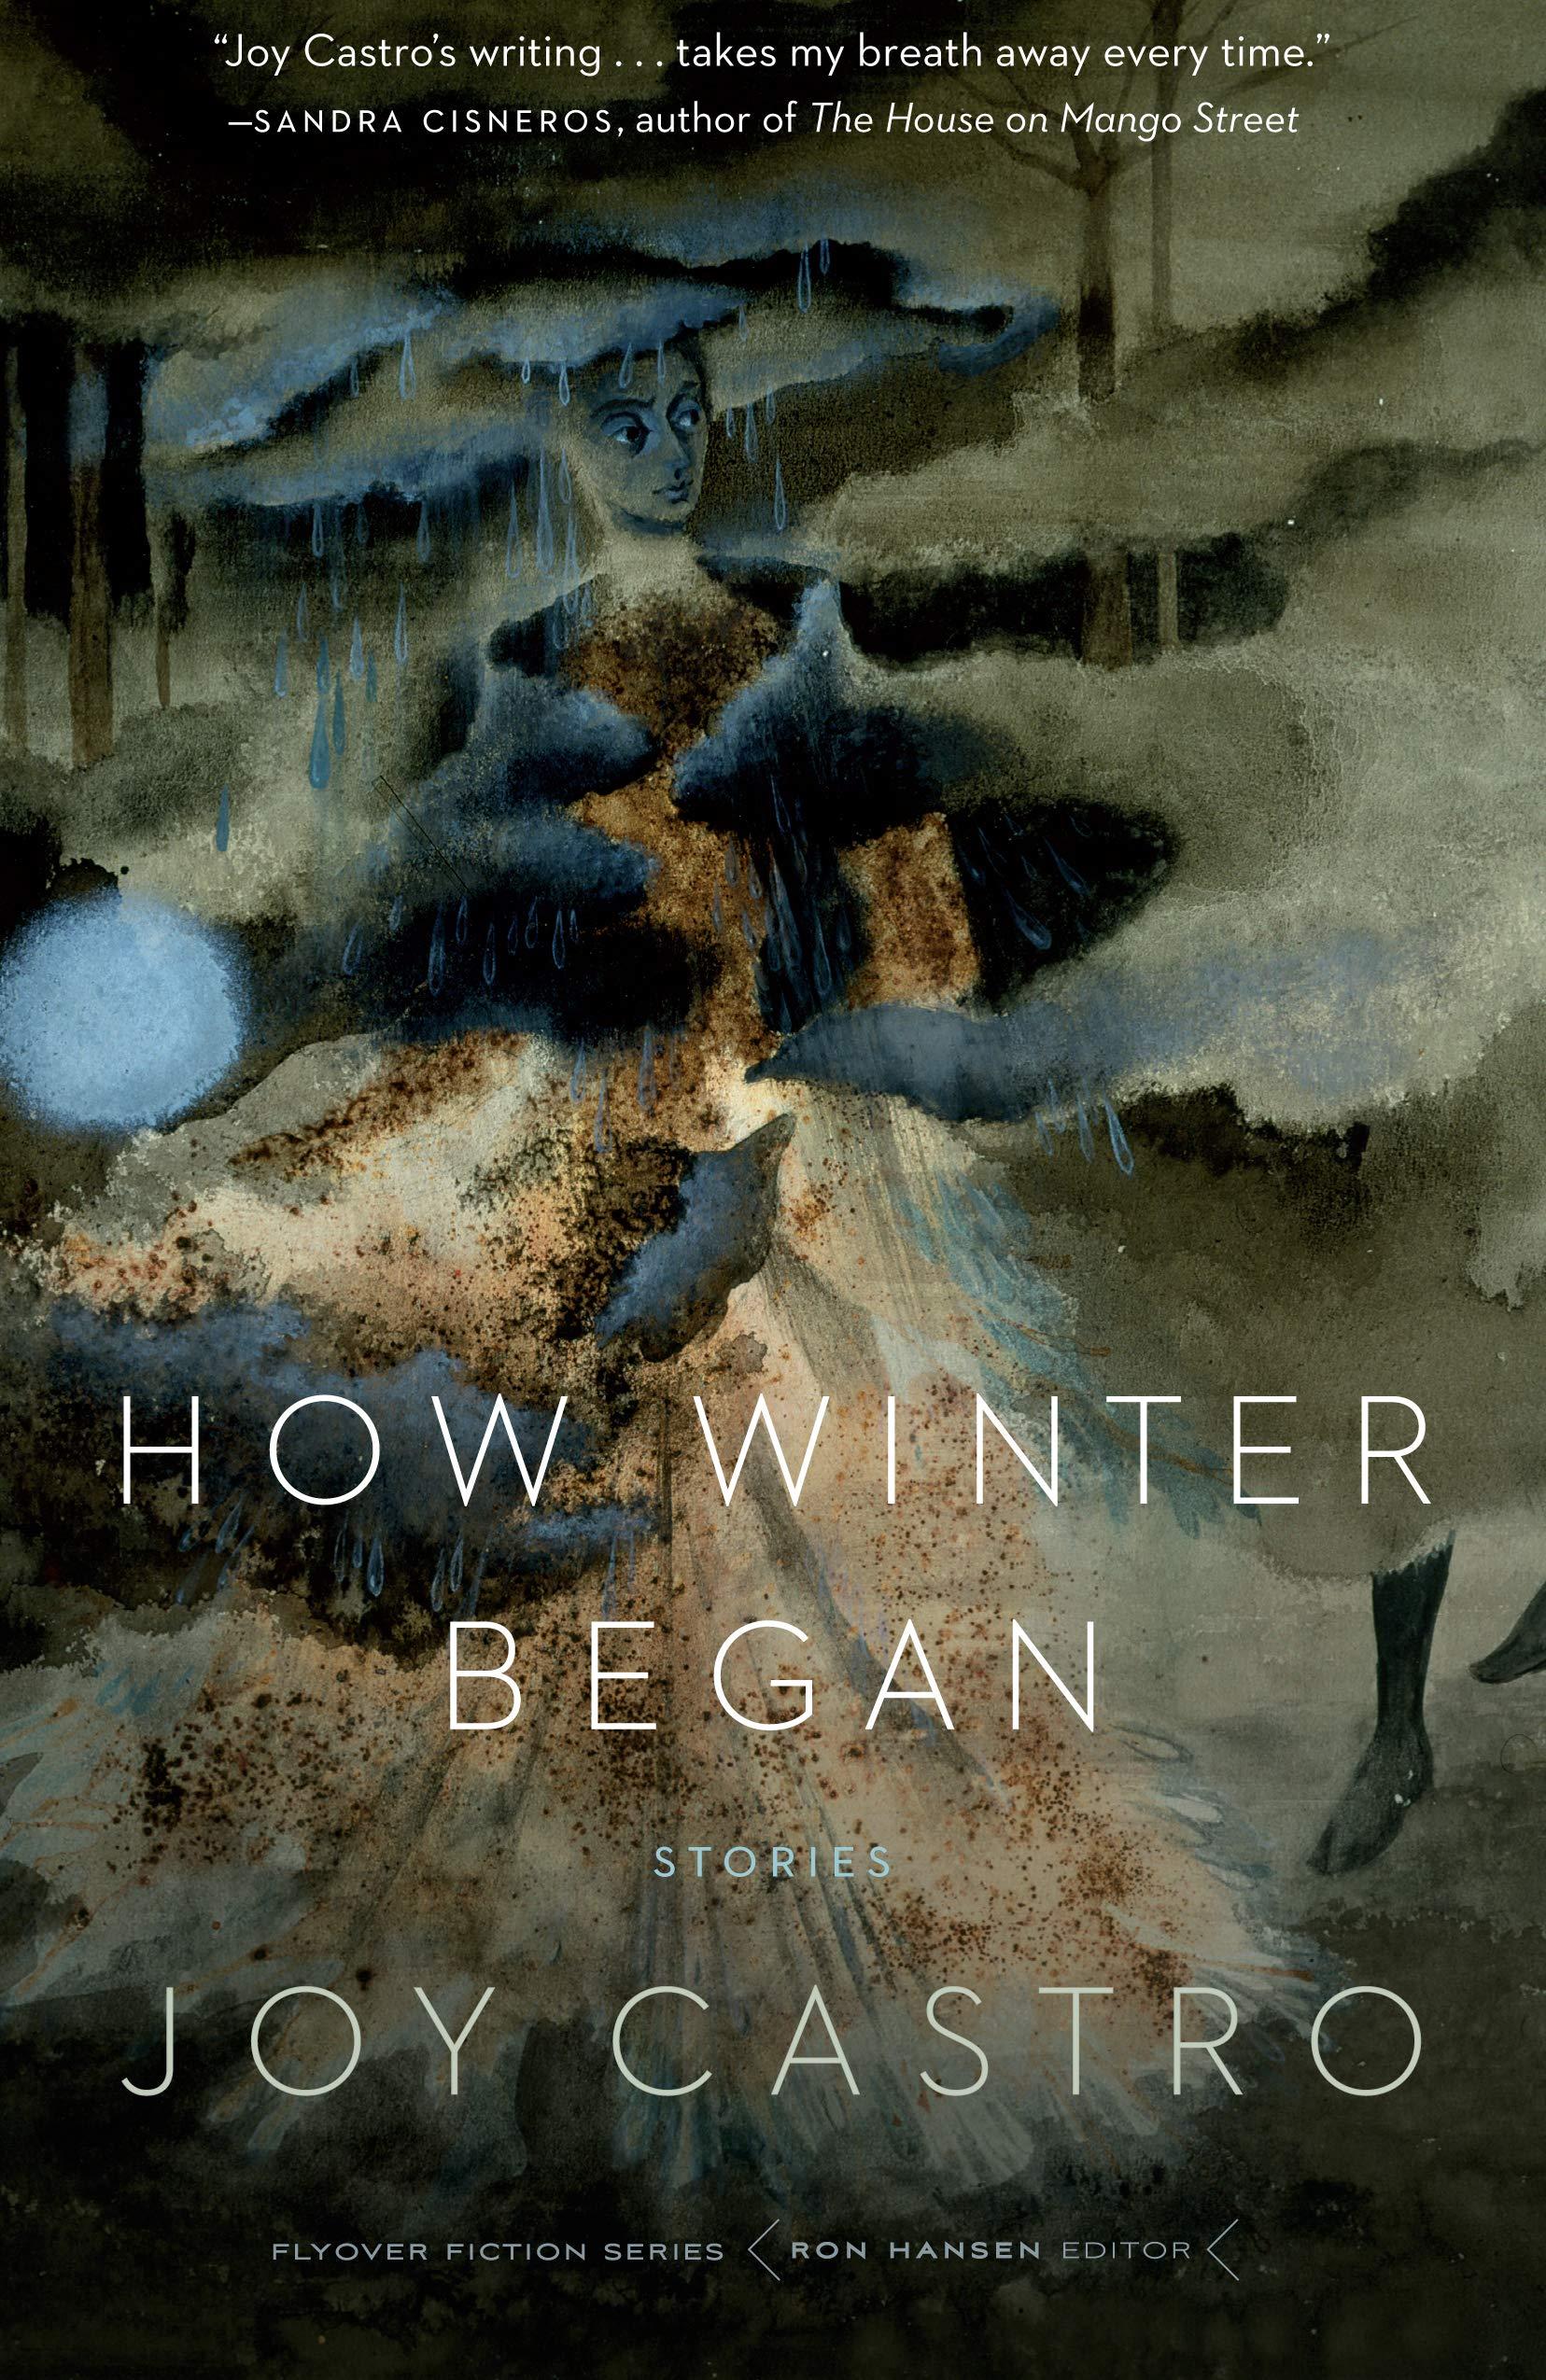 How Winter Began: Stories (Flyover Fiction): Amazon.es ...